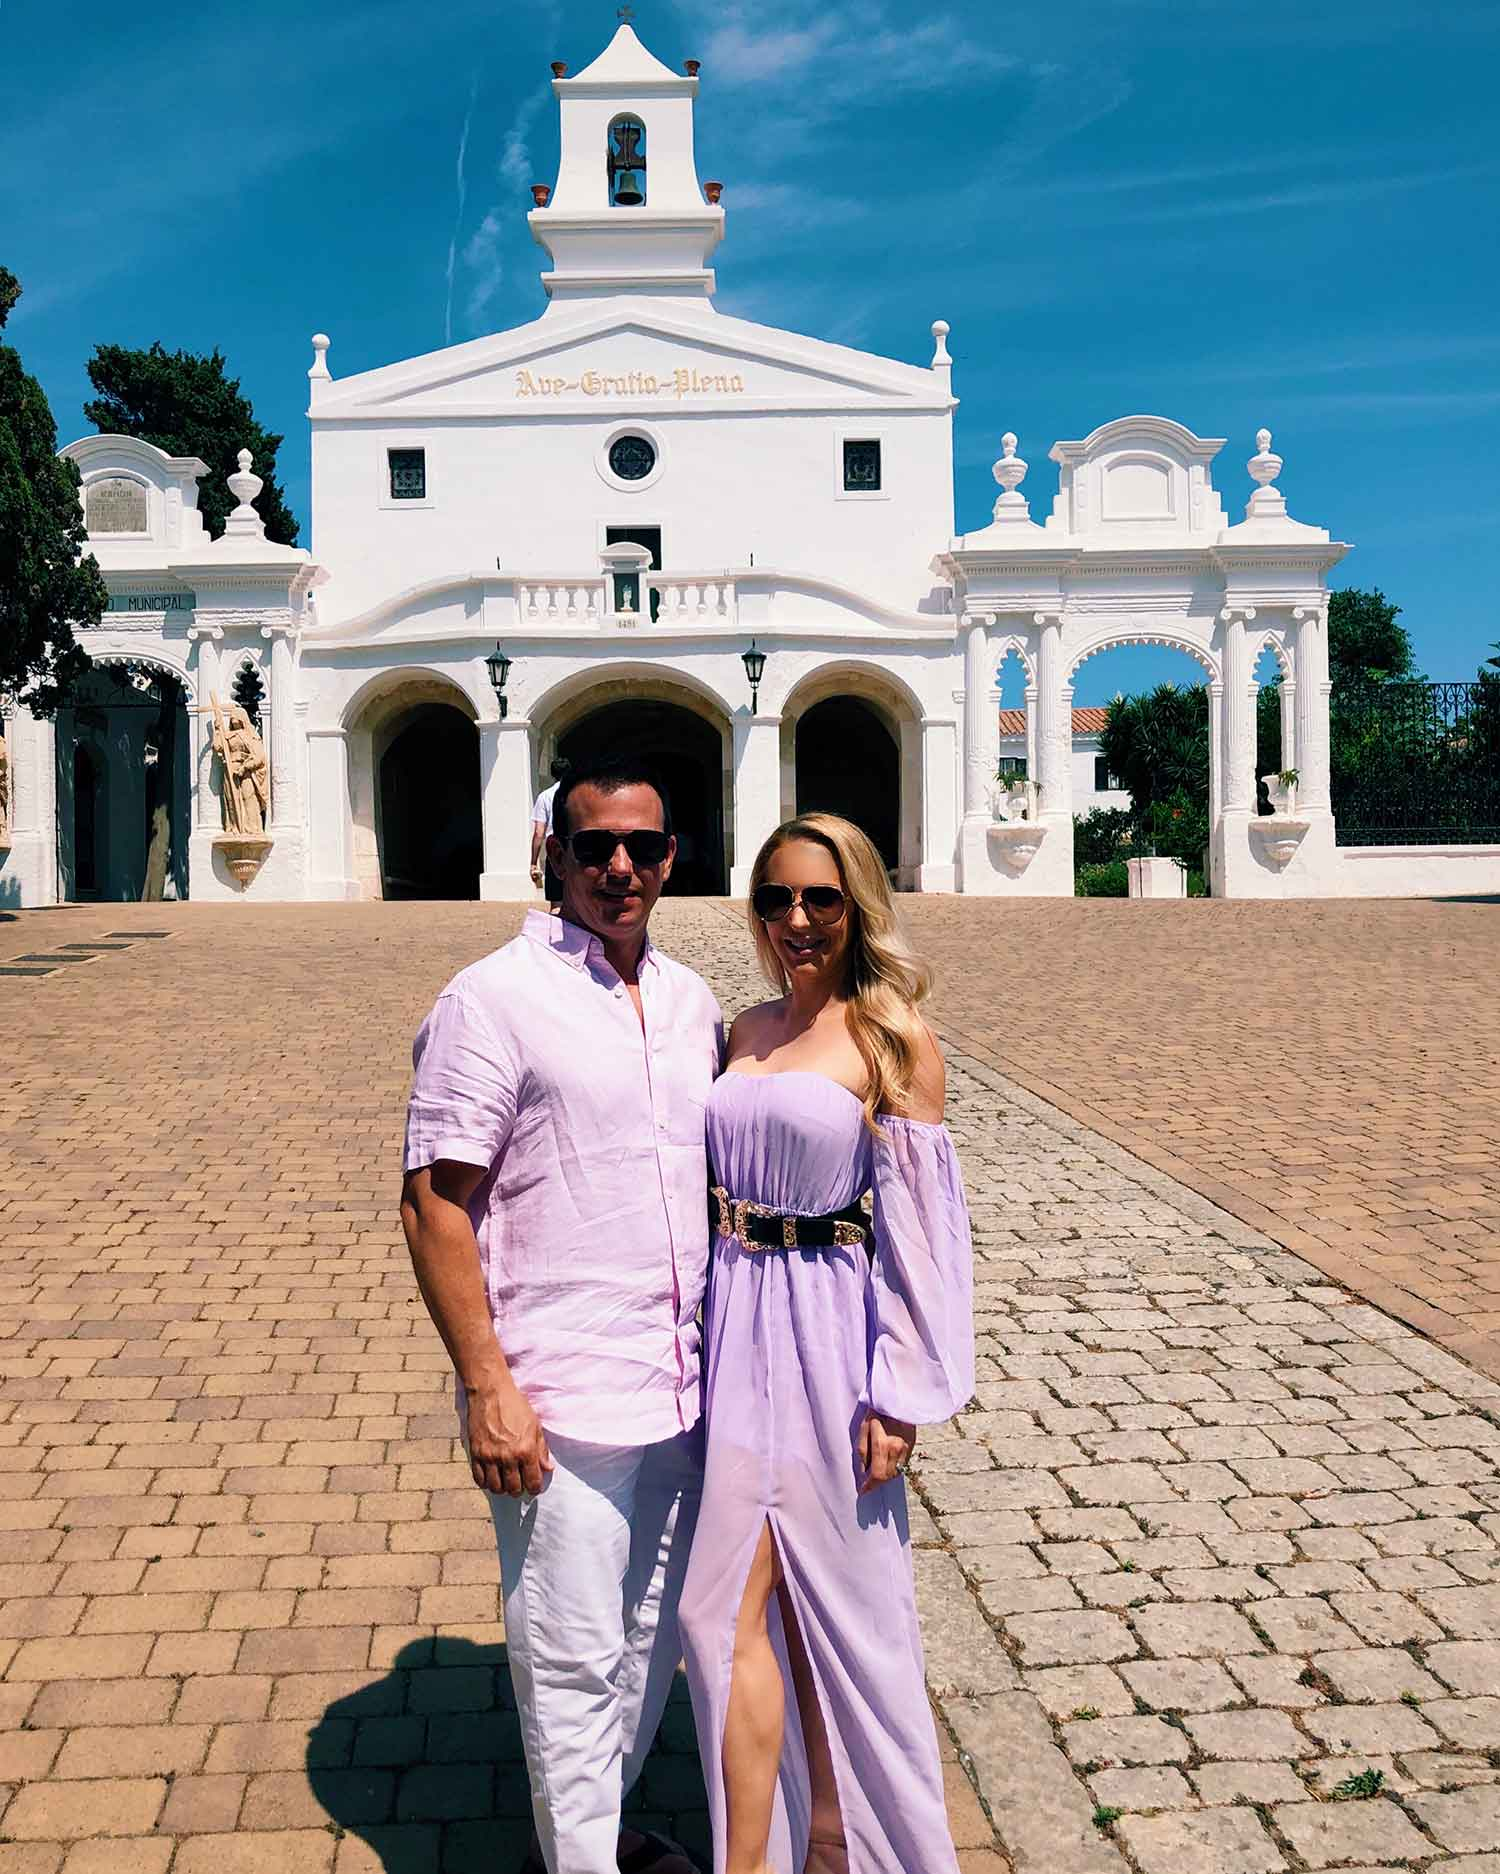 Eve husband white church Mahon Menorca